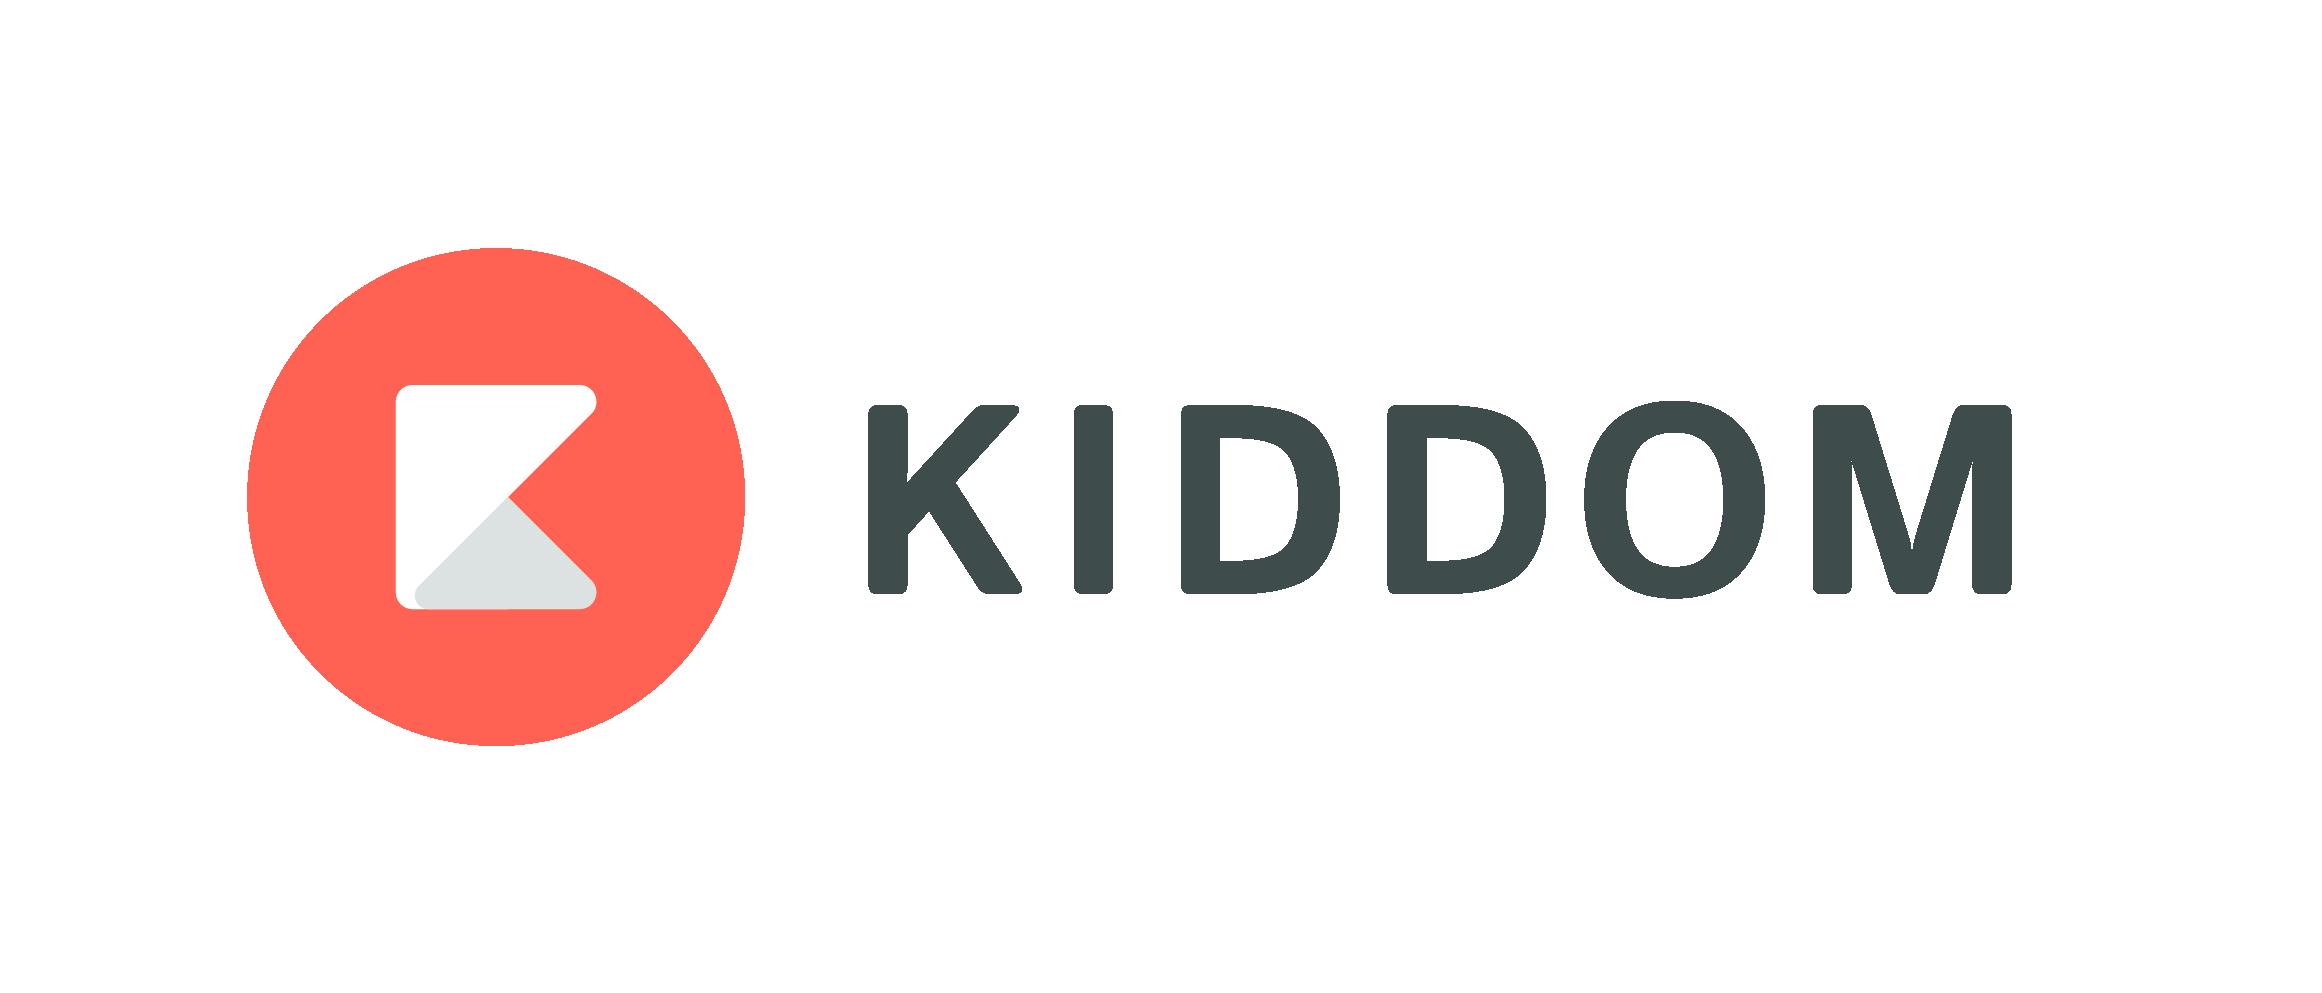 kiddom.png